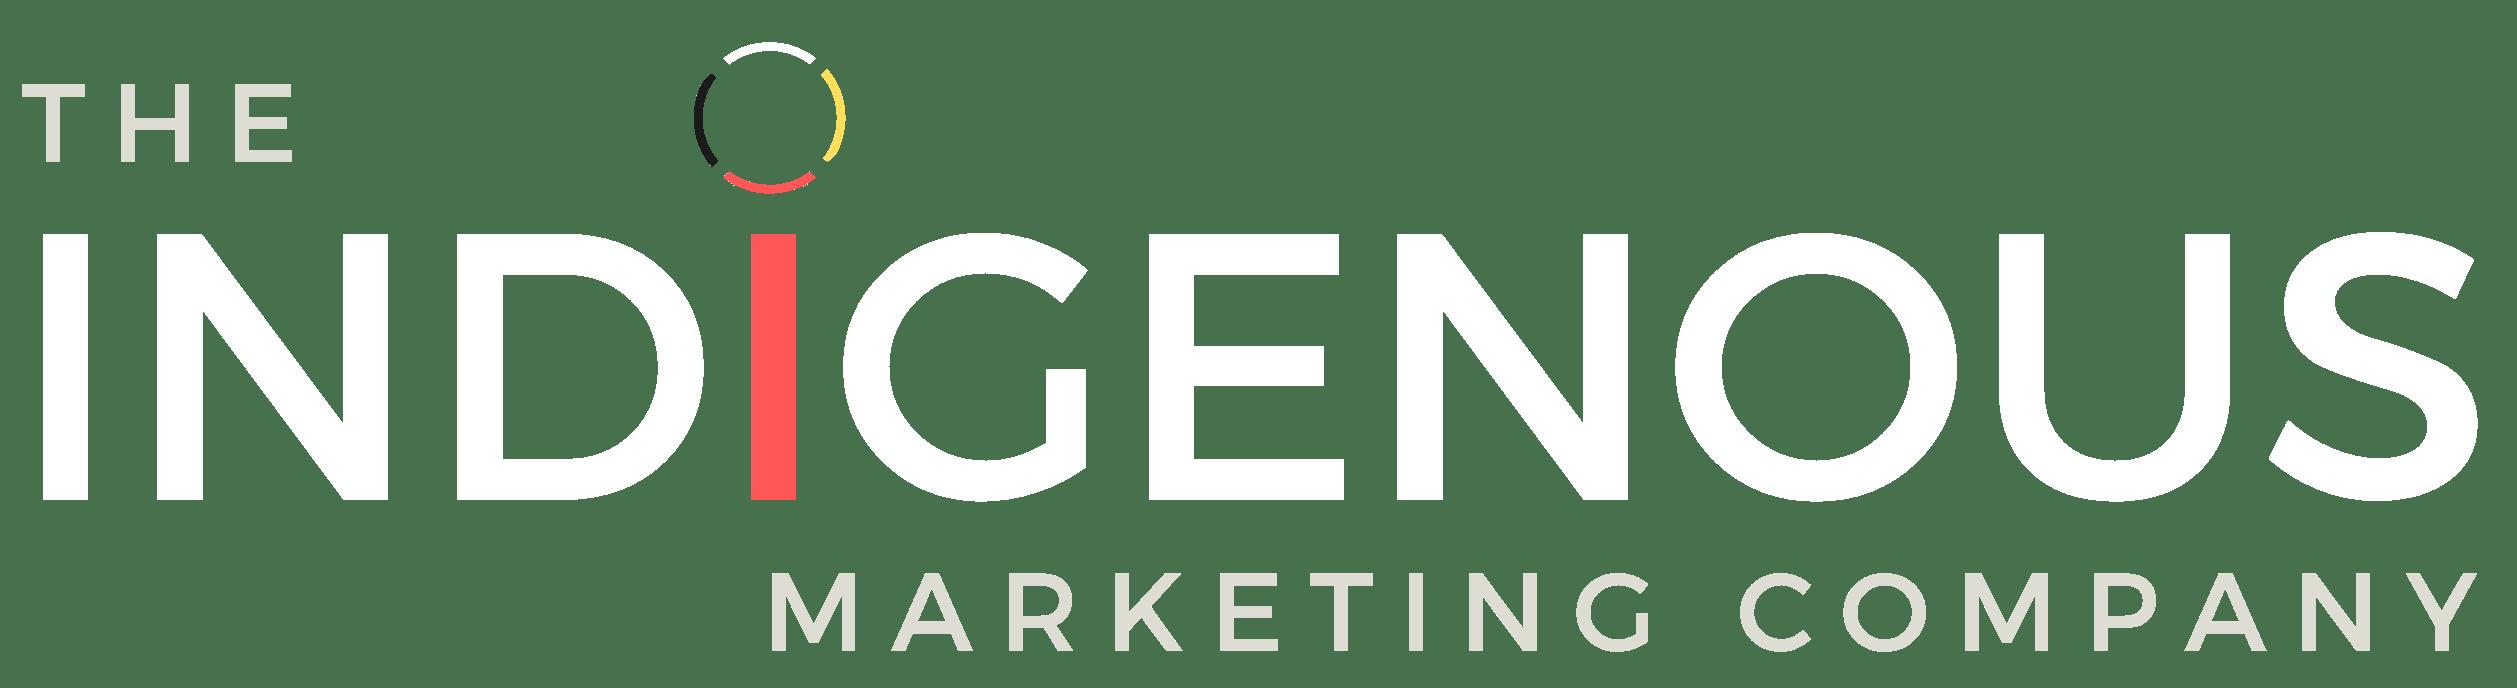 The Indigenous Marketing Company White Text Logo